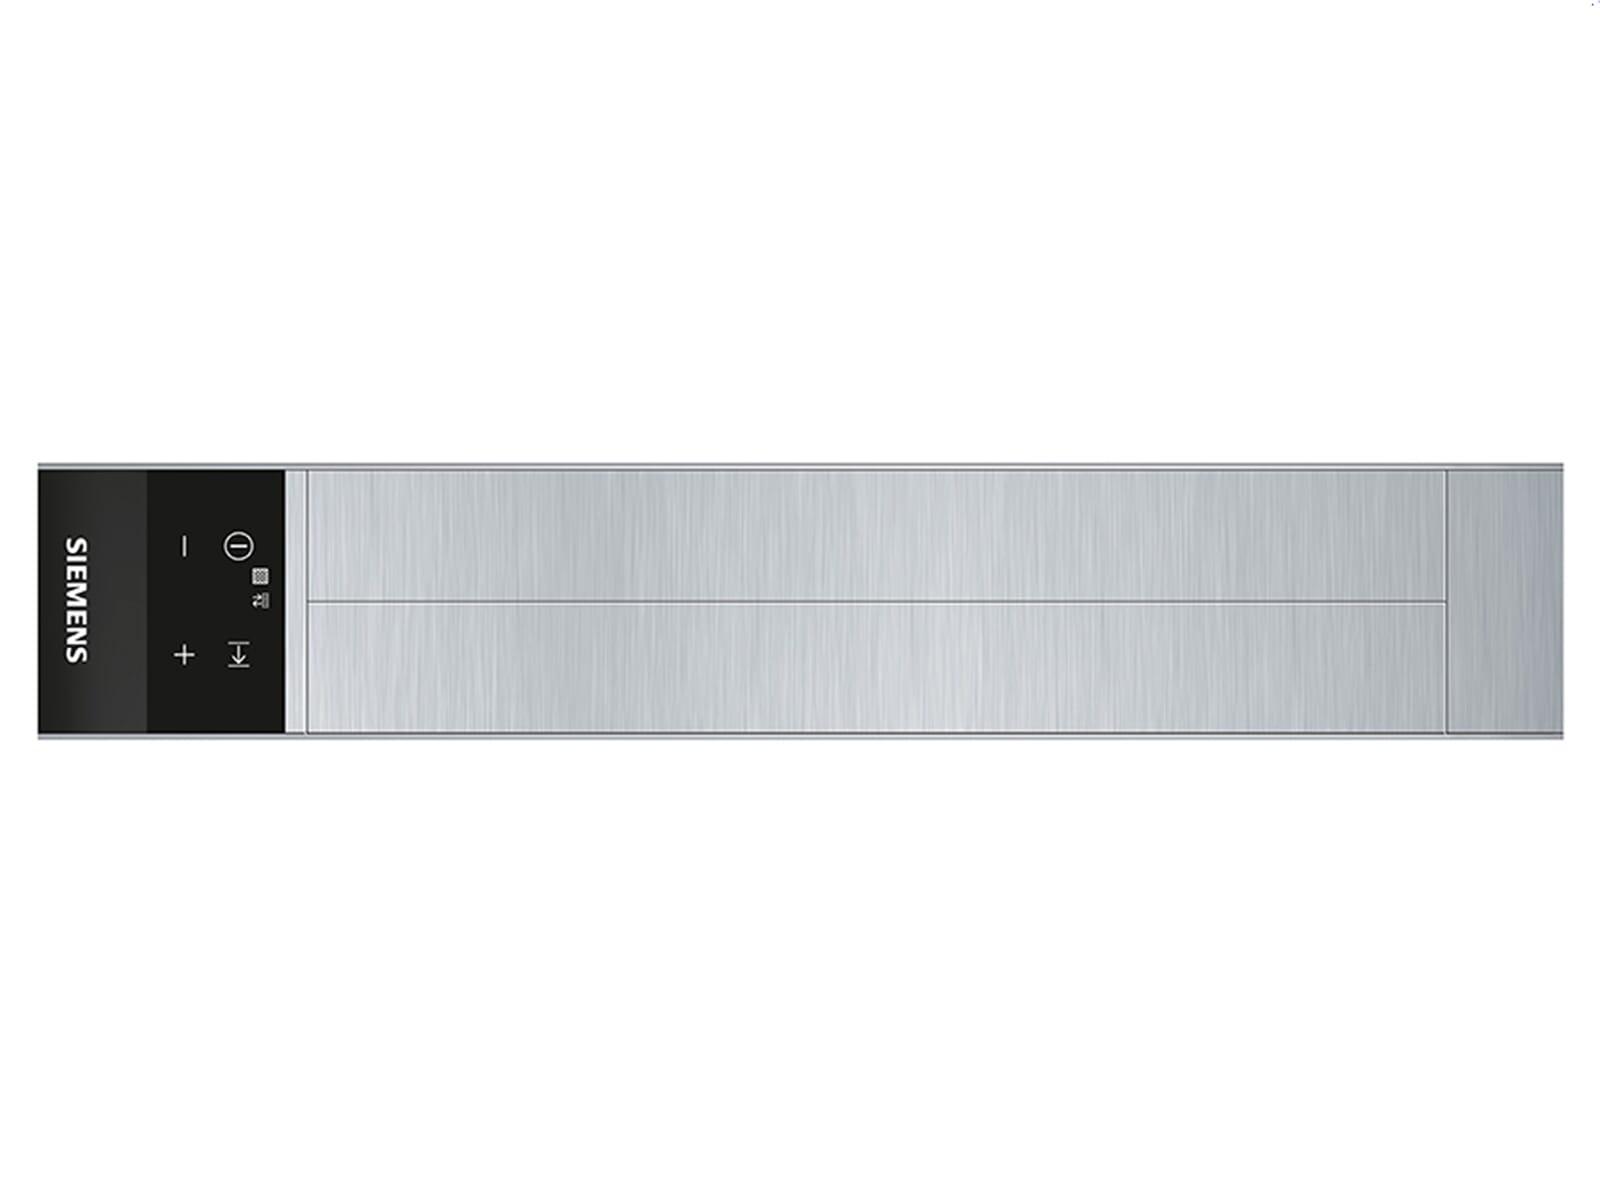 Siemens Kühlschrank Datenblatt : Siemens lf va tischlüfter kochfeldabzug